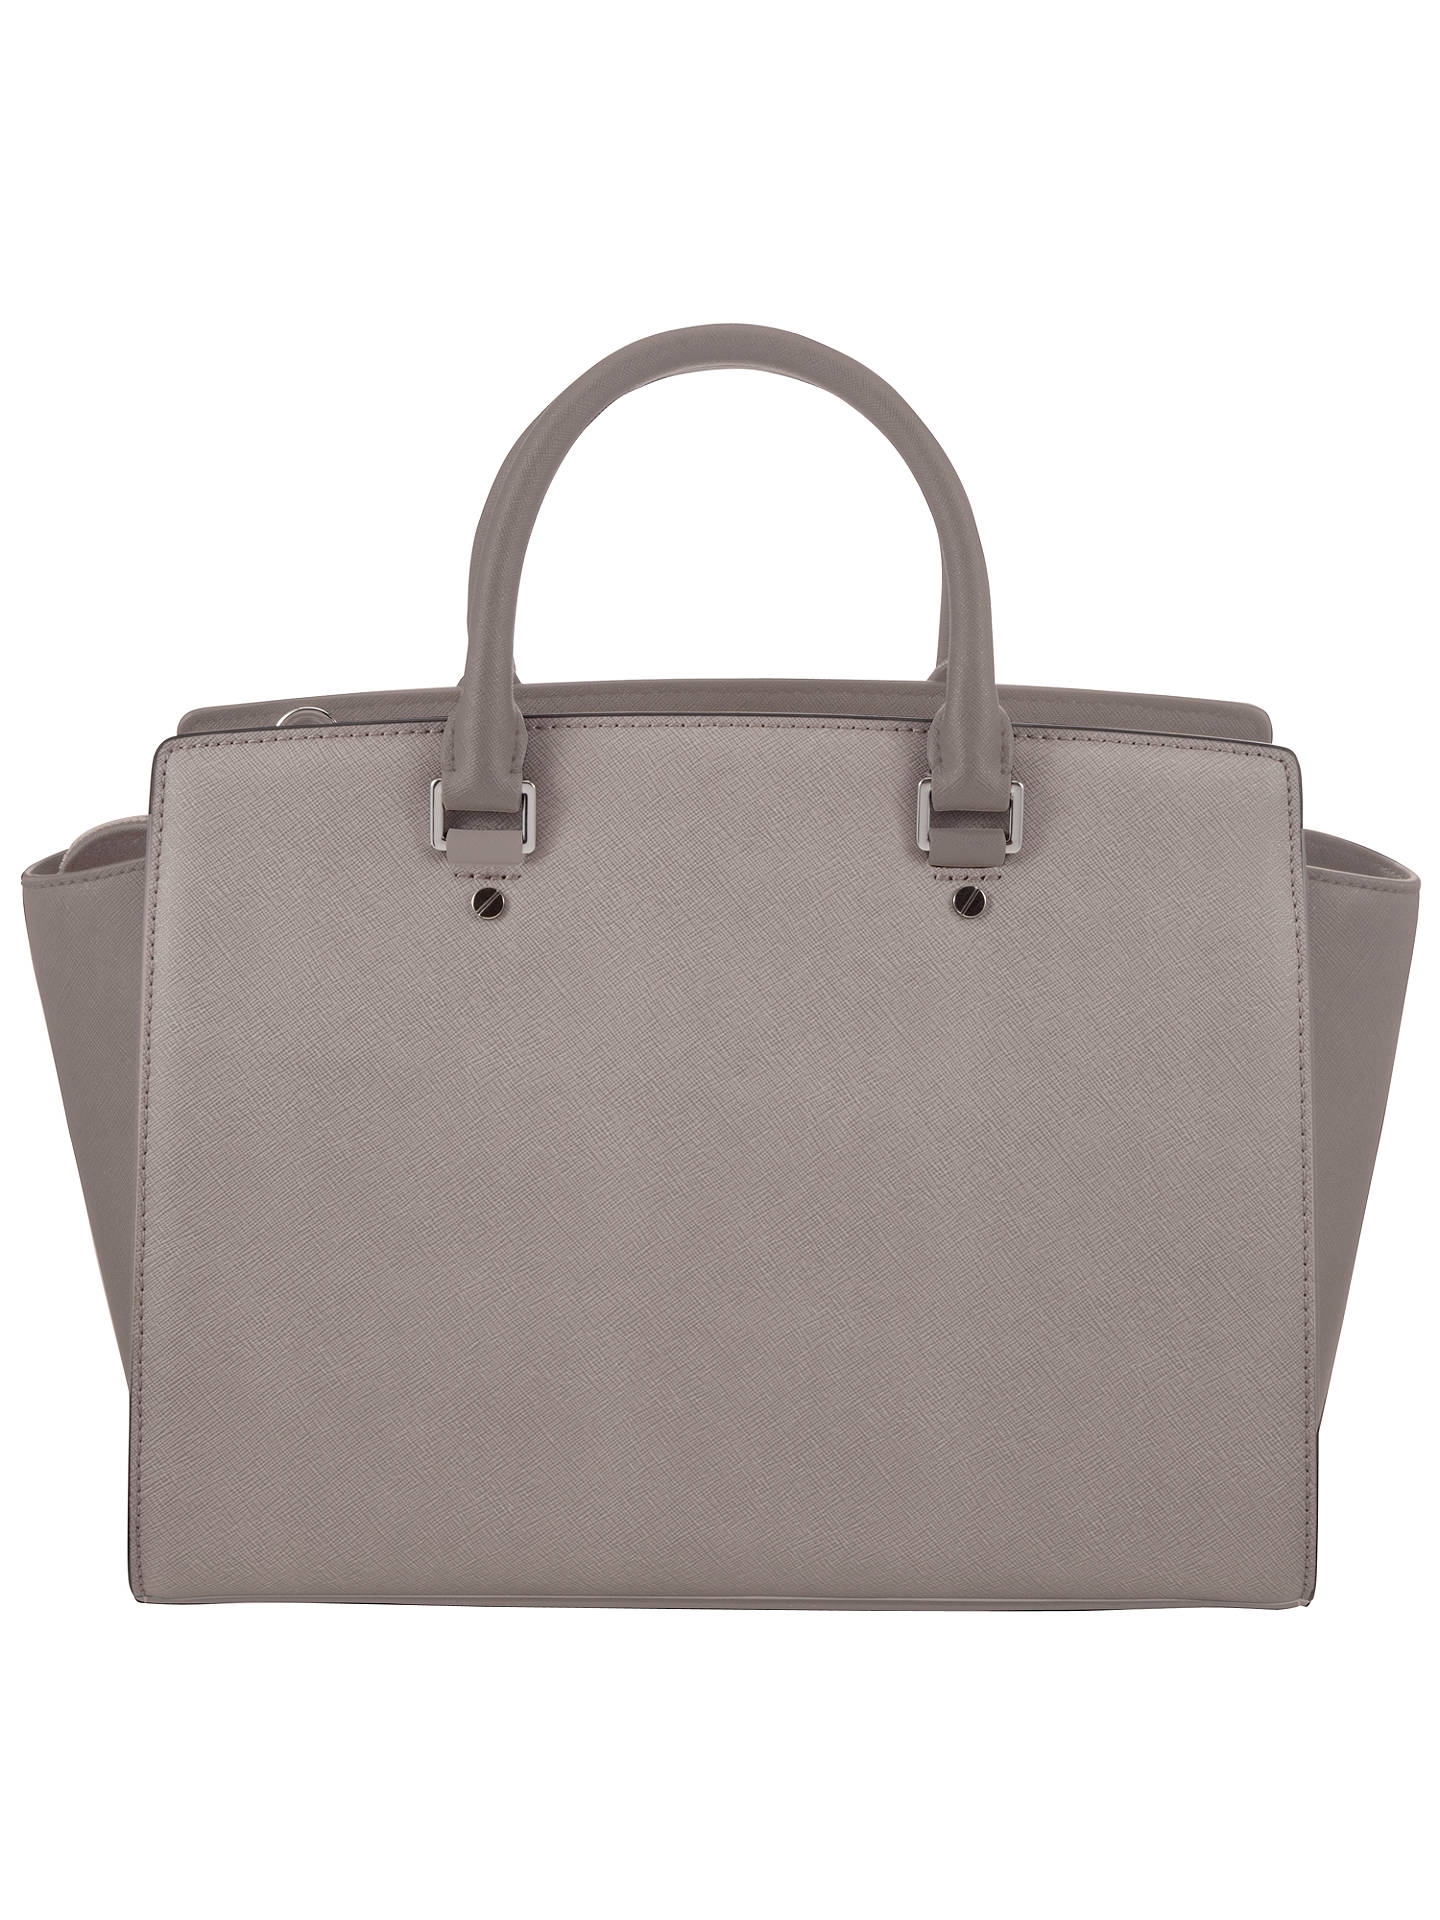 7ac1db8a4e87e1 ... Buy MICHAEL Michael Kors Selma Large Leather Top Zip Satchel Bag, Grey  Online at johnlewis ...